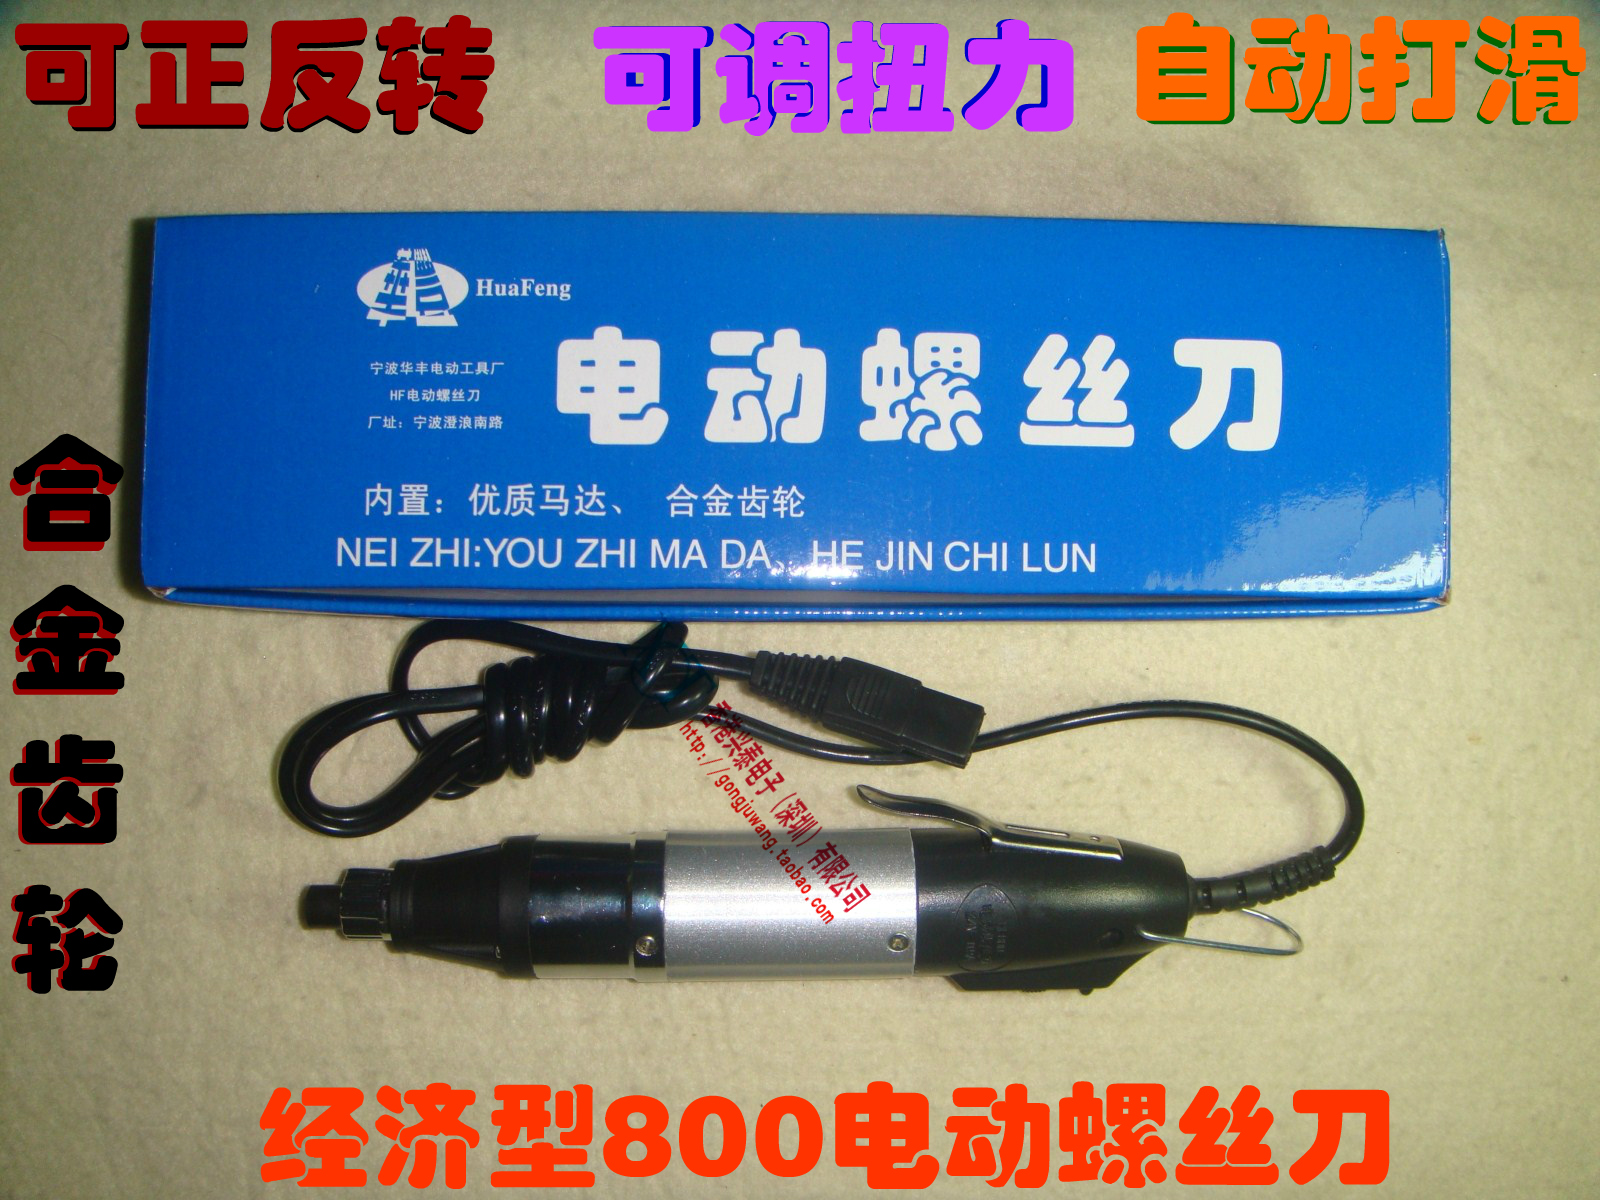 цена на Электроотвёртка Huafeng  800